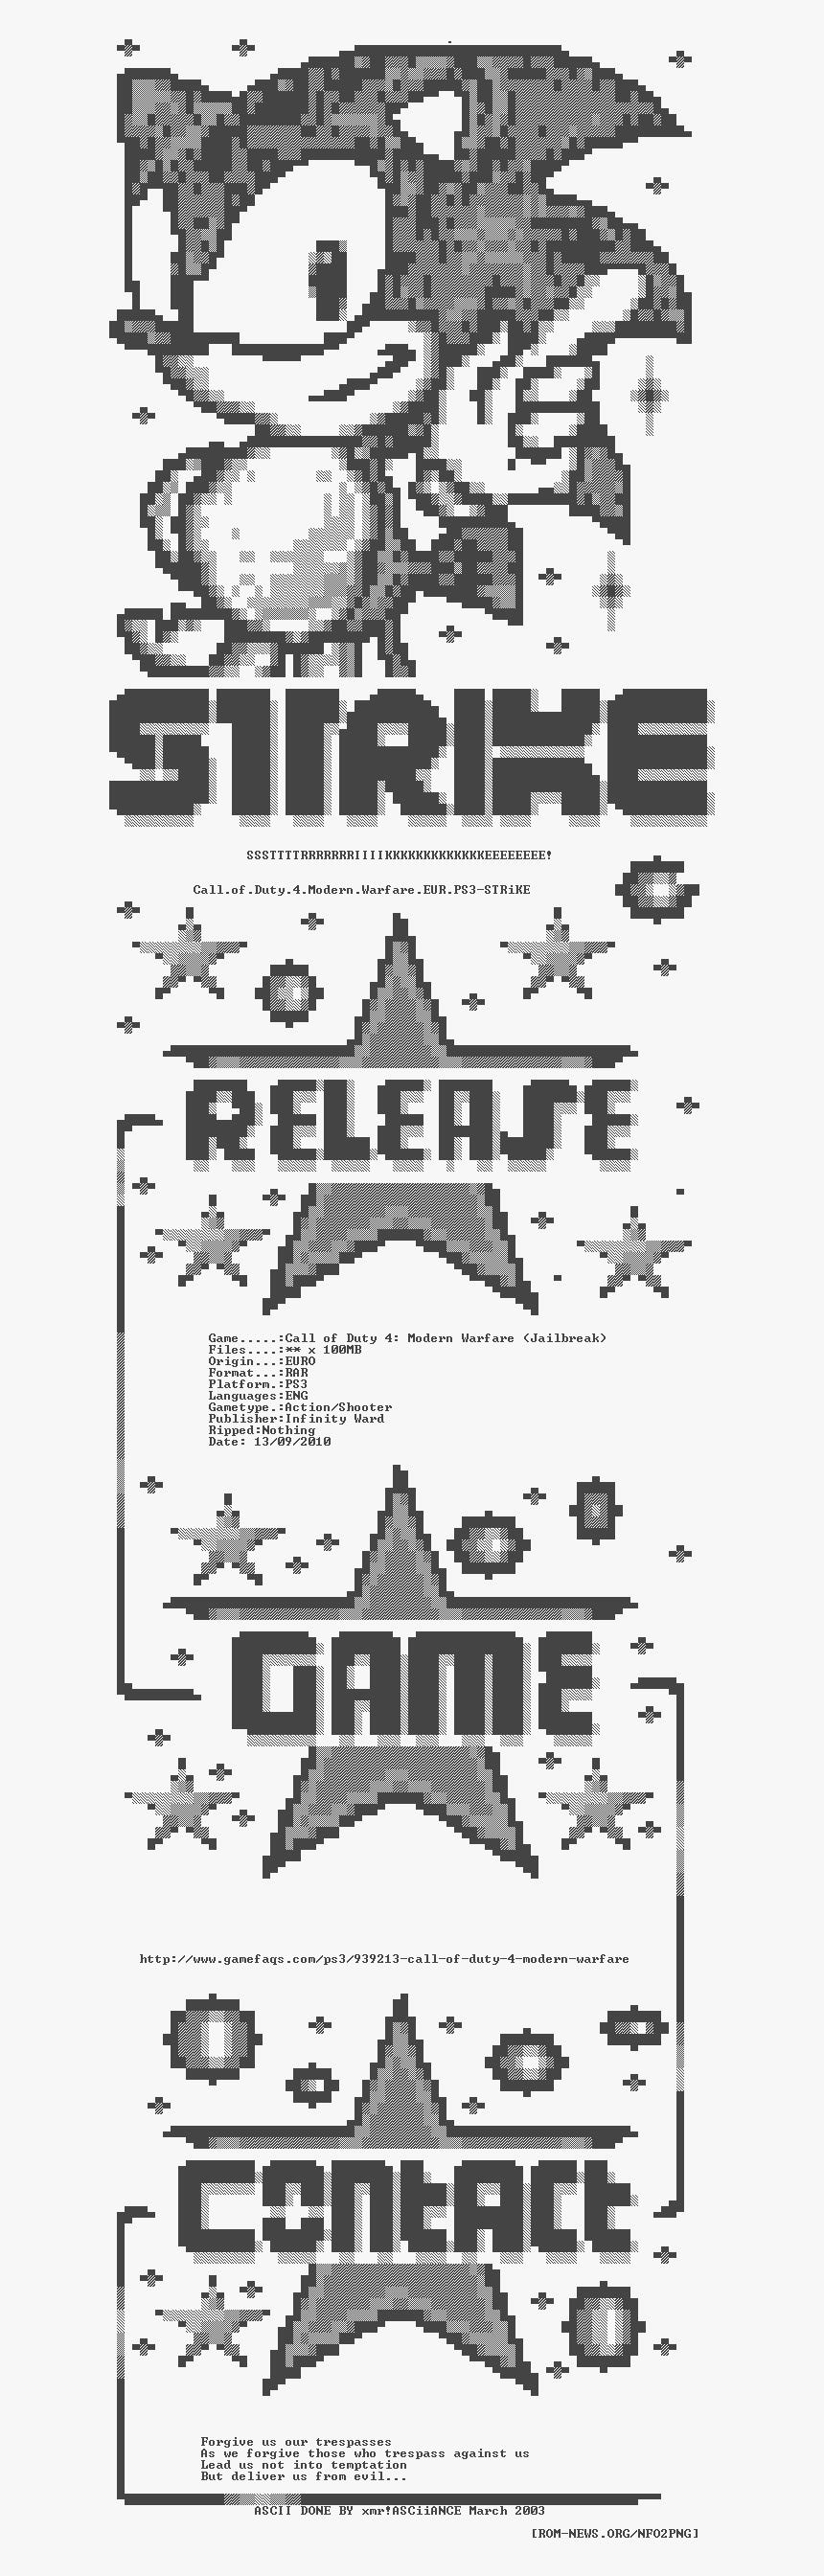 Call Of Duty 4 Modern Warfare Eur Ps3 Strike Poster Hd Png Download Transparent Png Image Pngitem